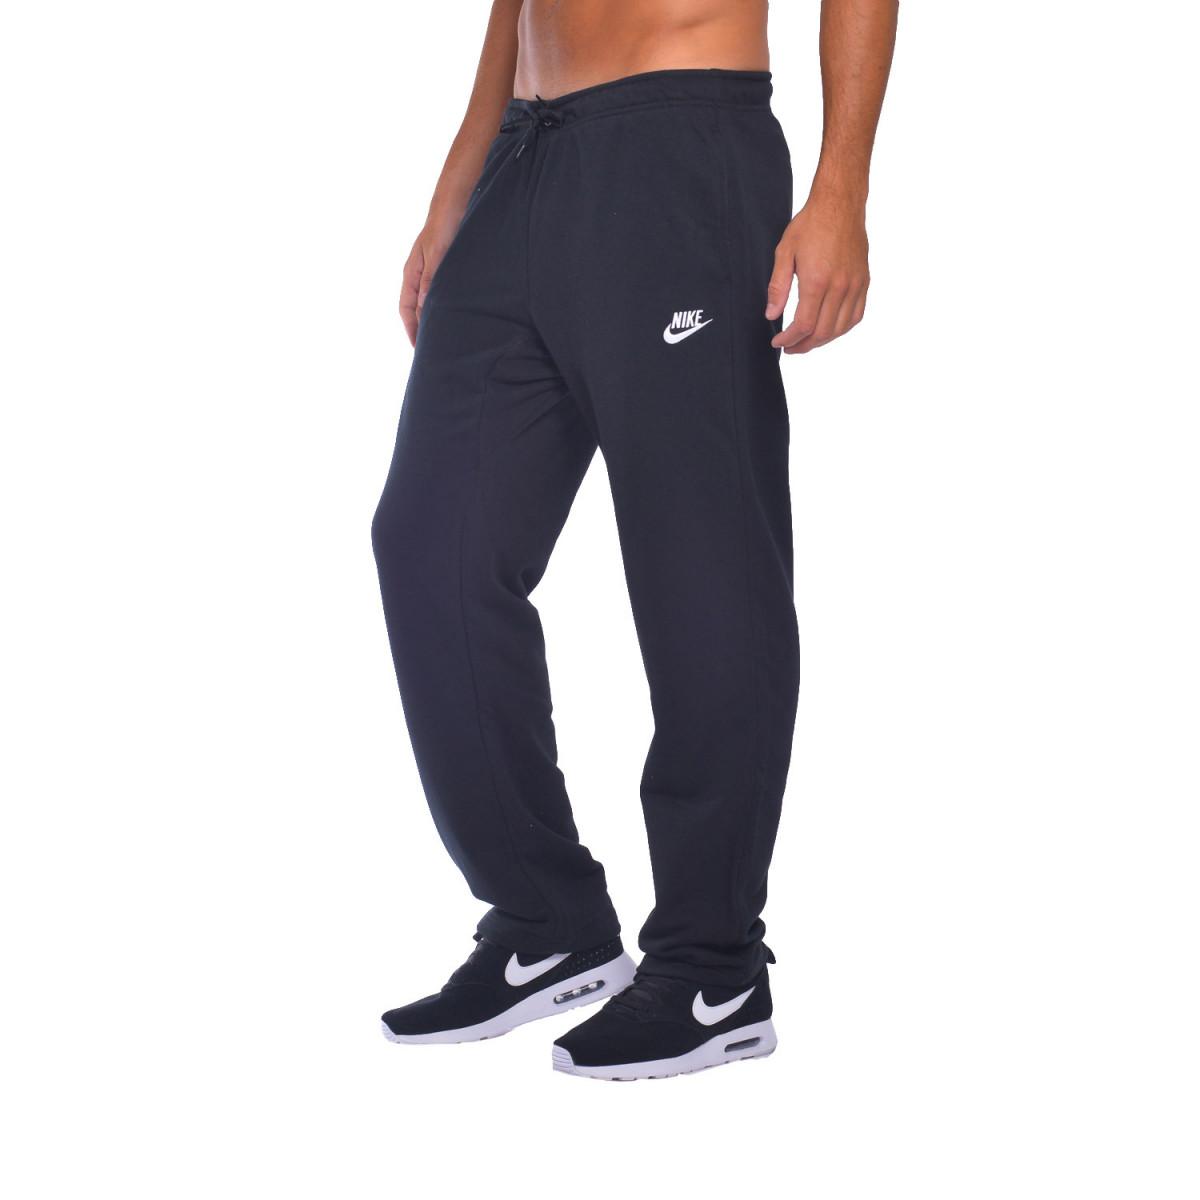 Pantalon Nike Club Oh 20 Ft Hombre Off wxwFvfarq